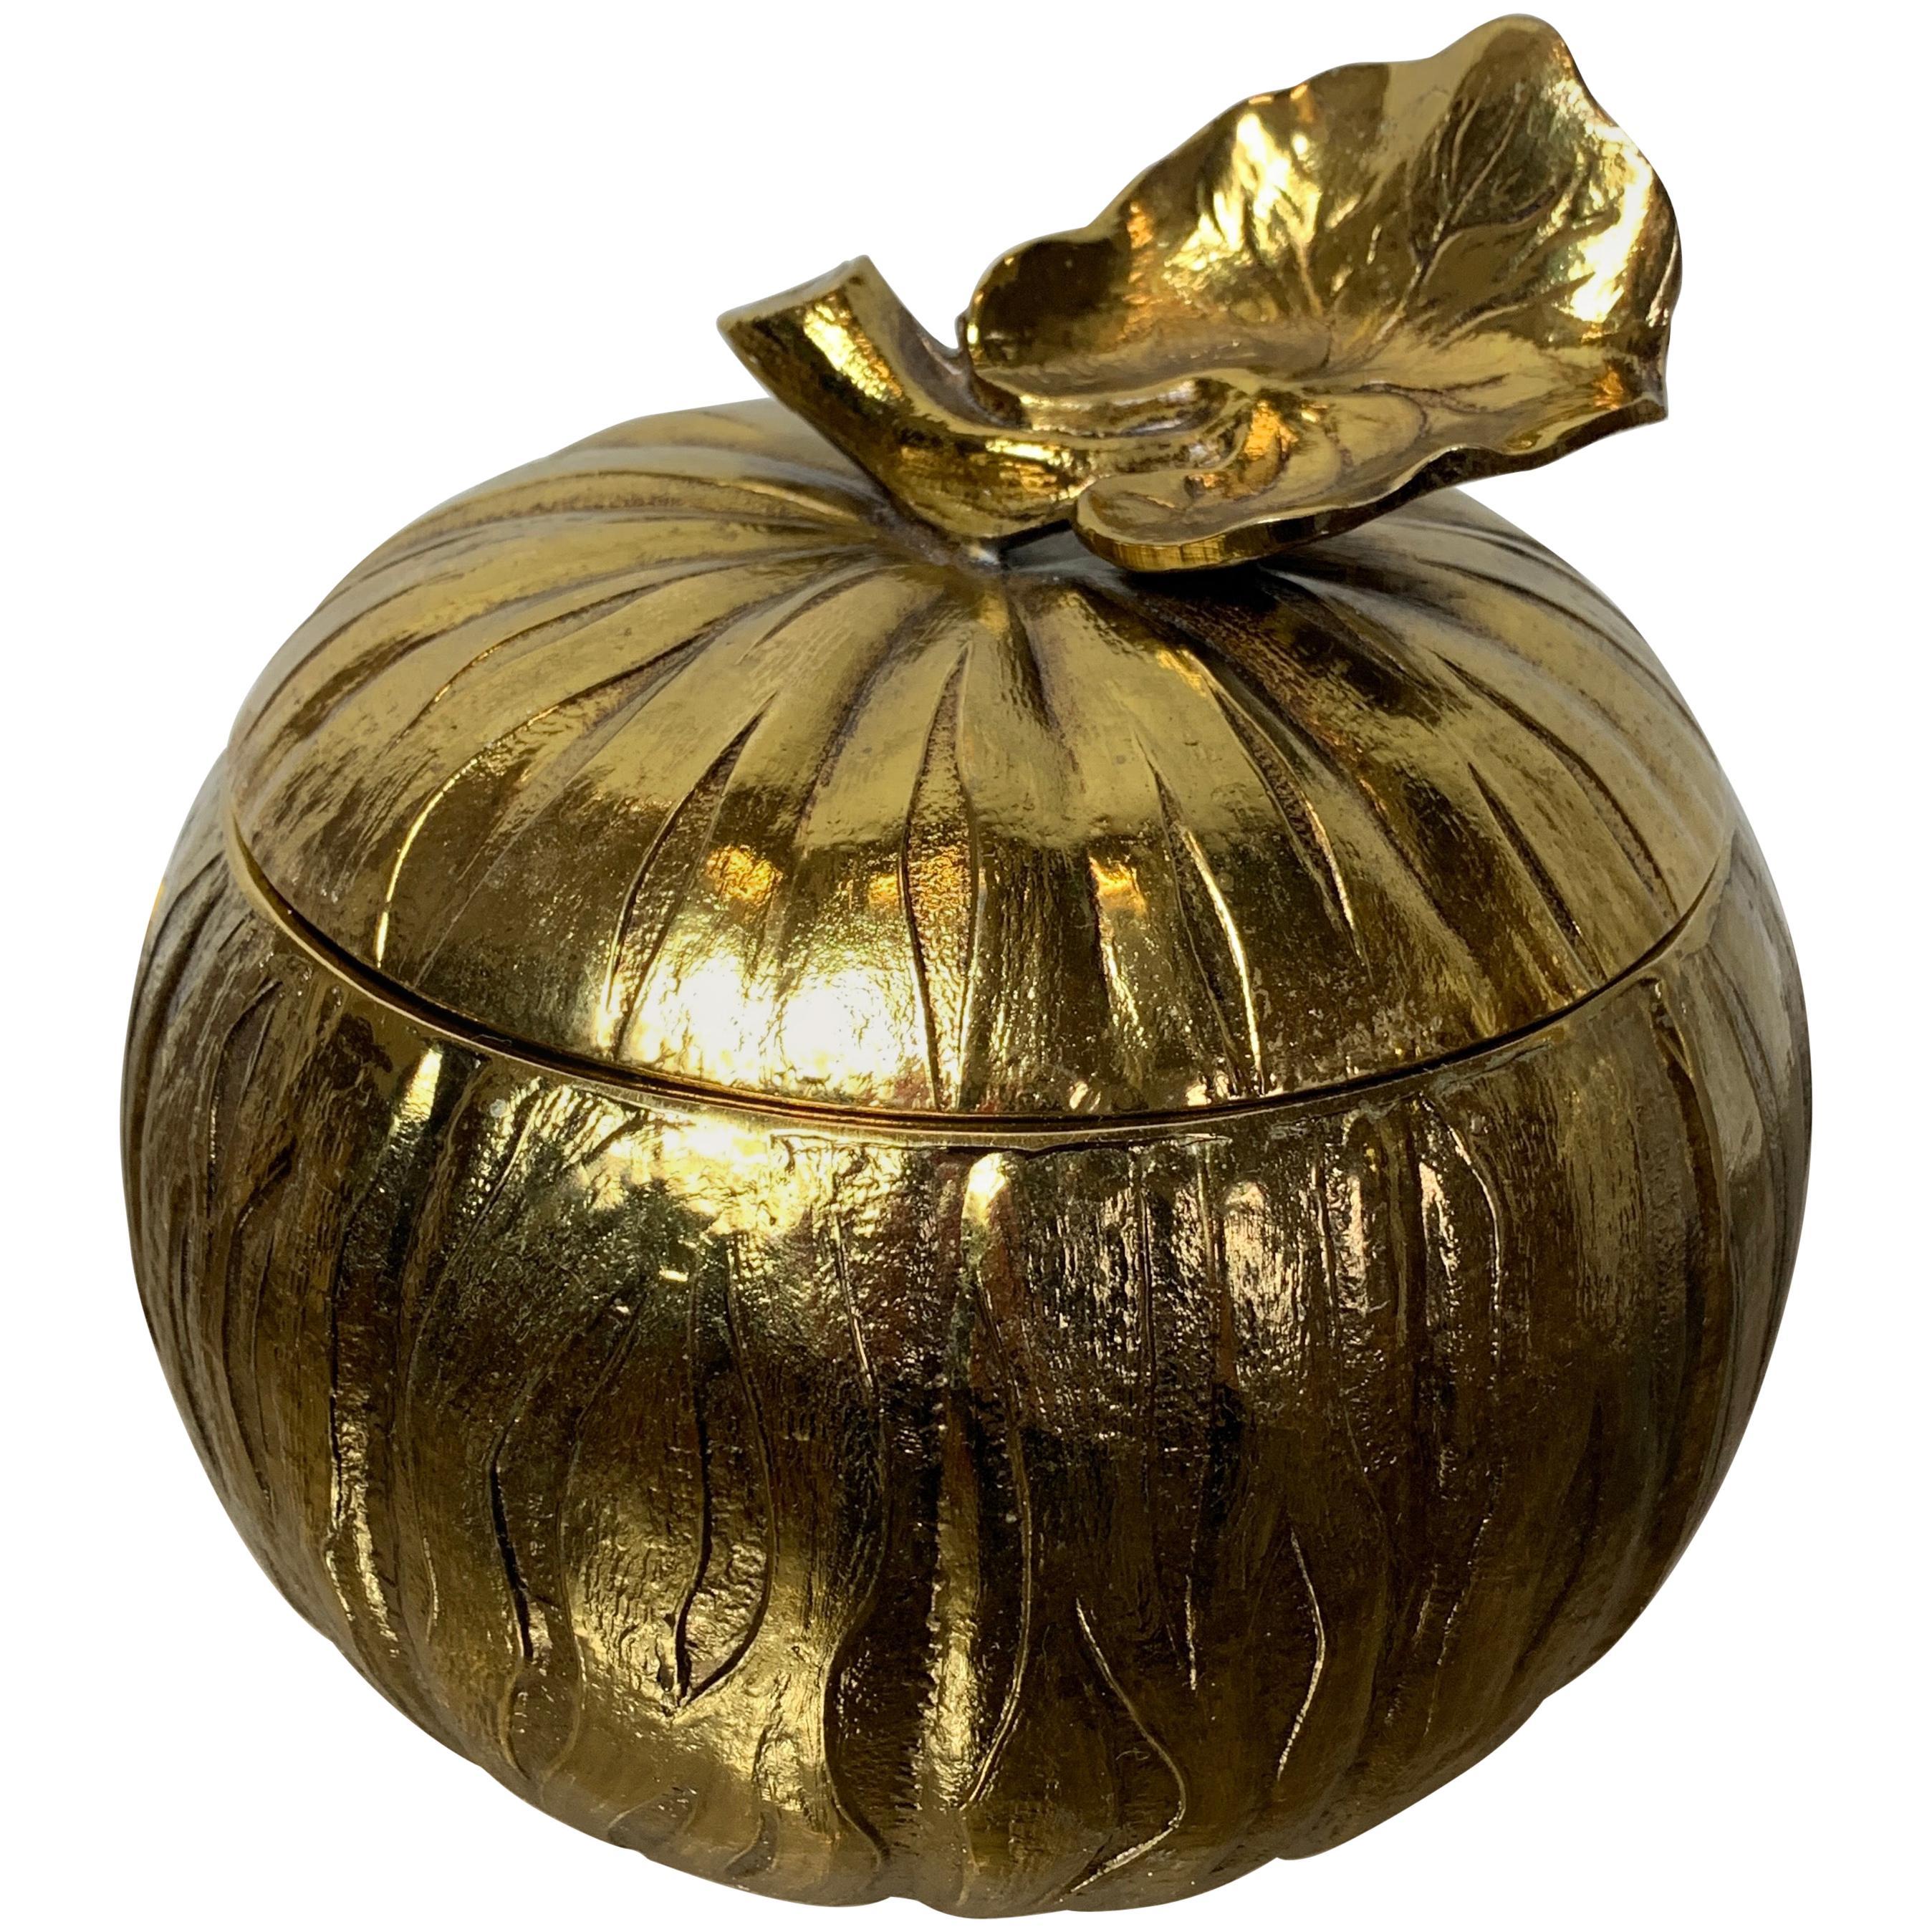 Mauro Manetti Gold Pumpkin Ice Bucket, 1960s